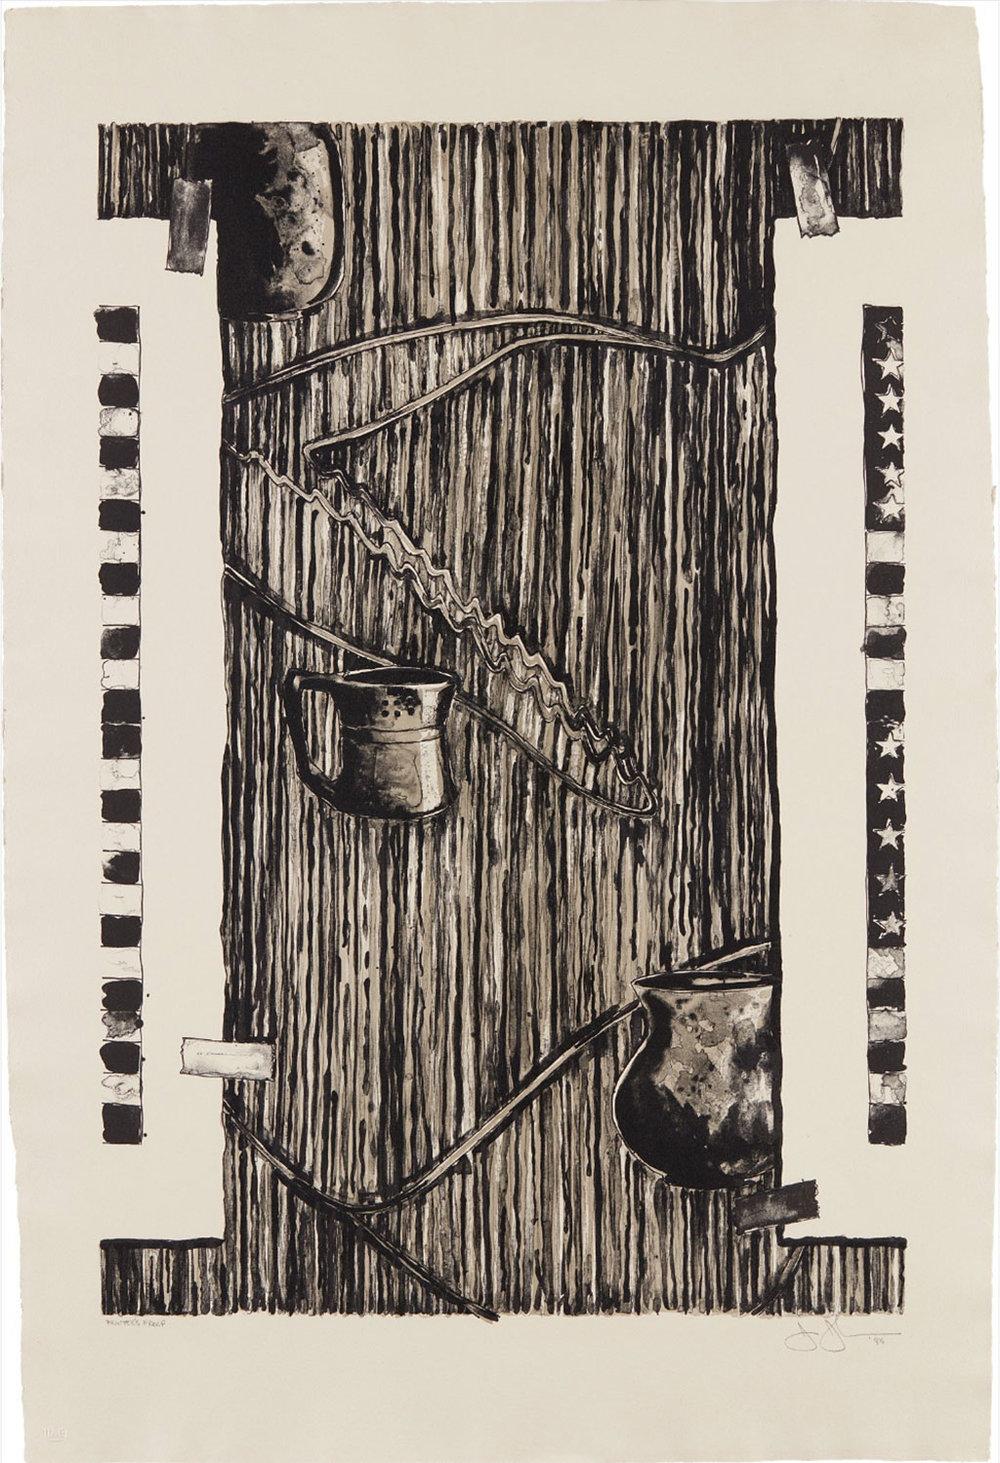 Ventriloquist by Jasper Johns